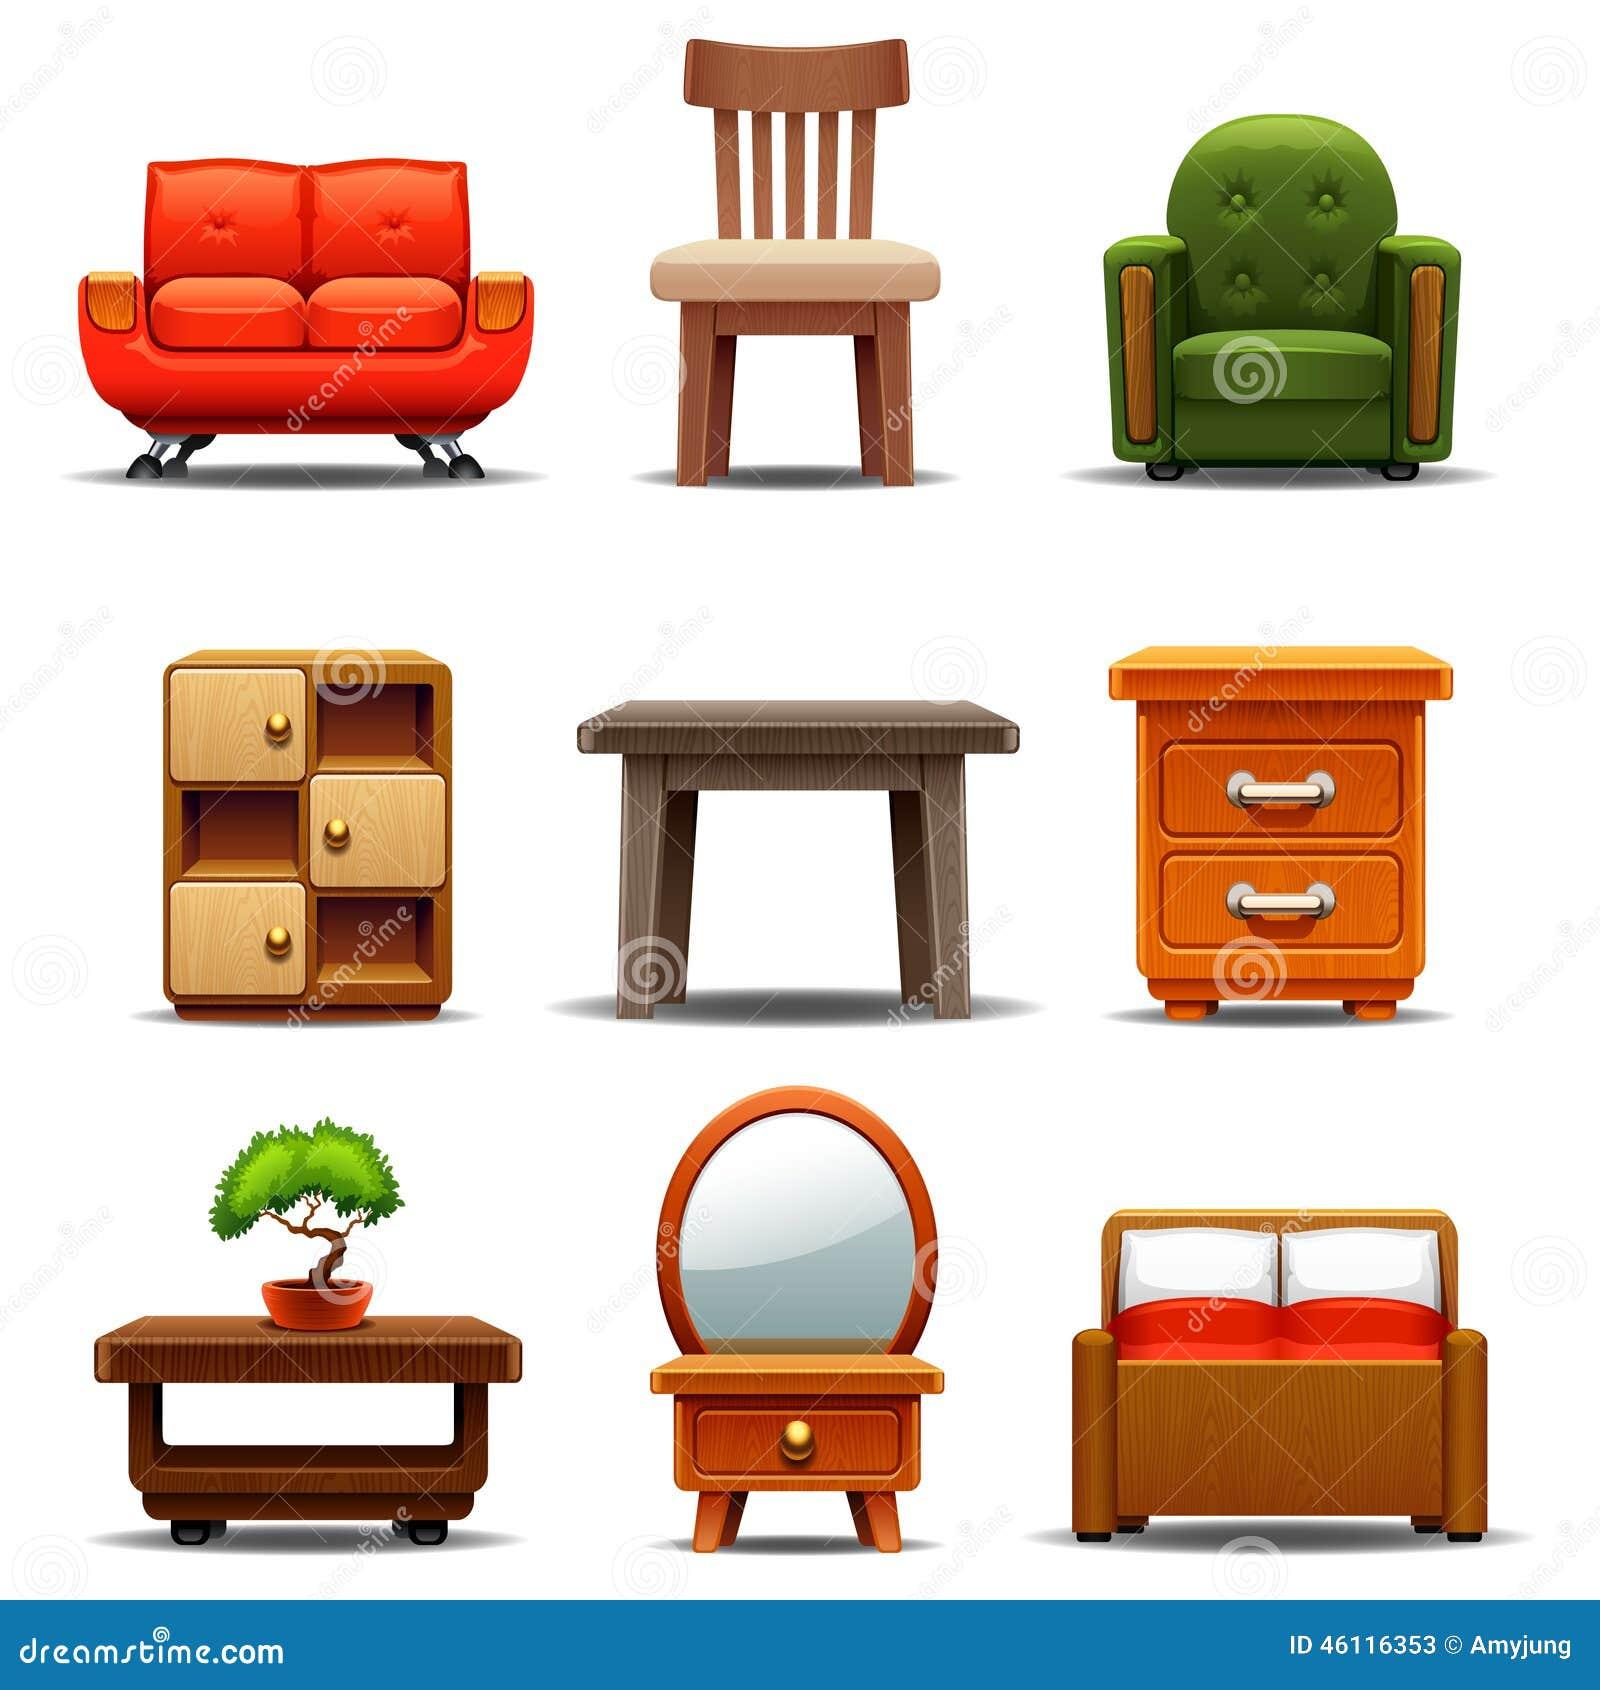 Modern Furniture Stock Vector. Illustration Of Heavily